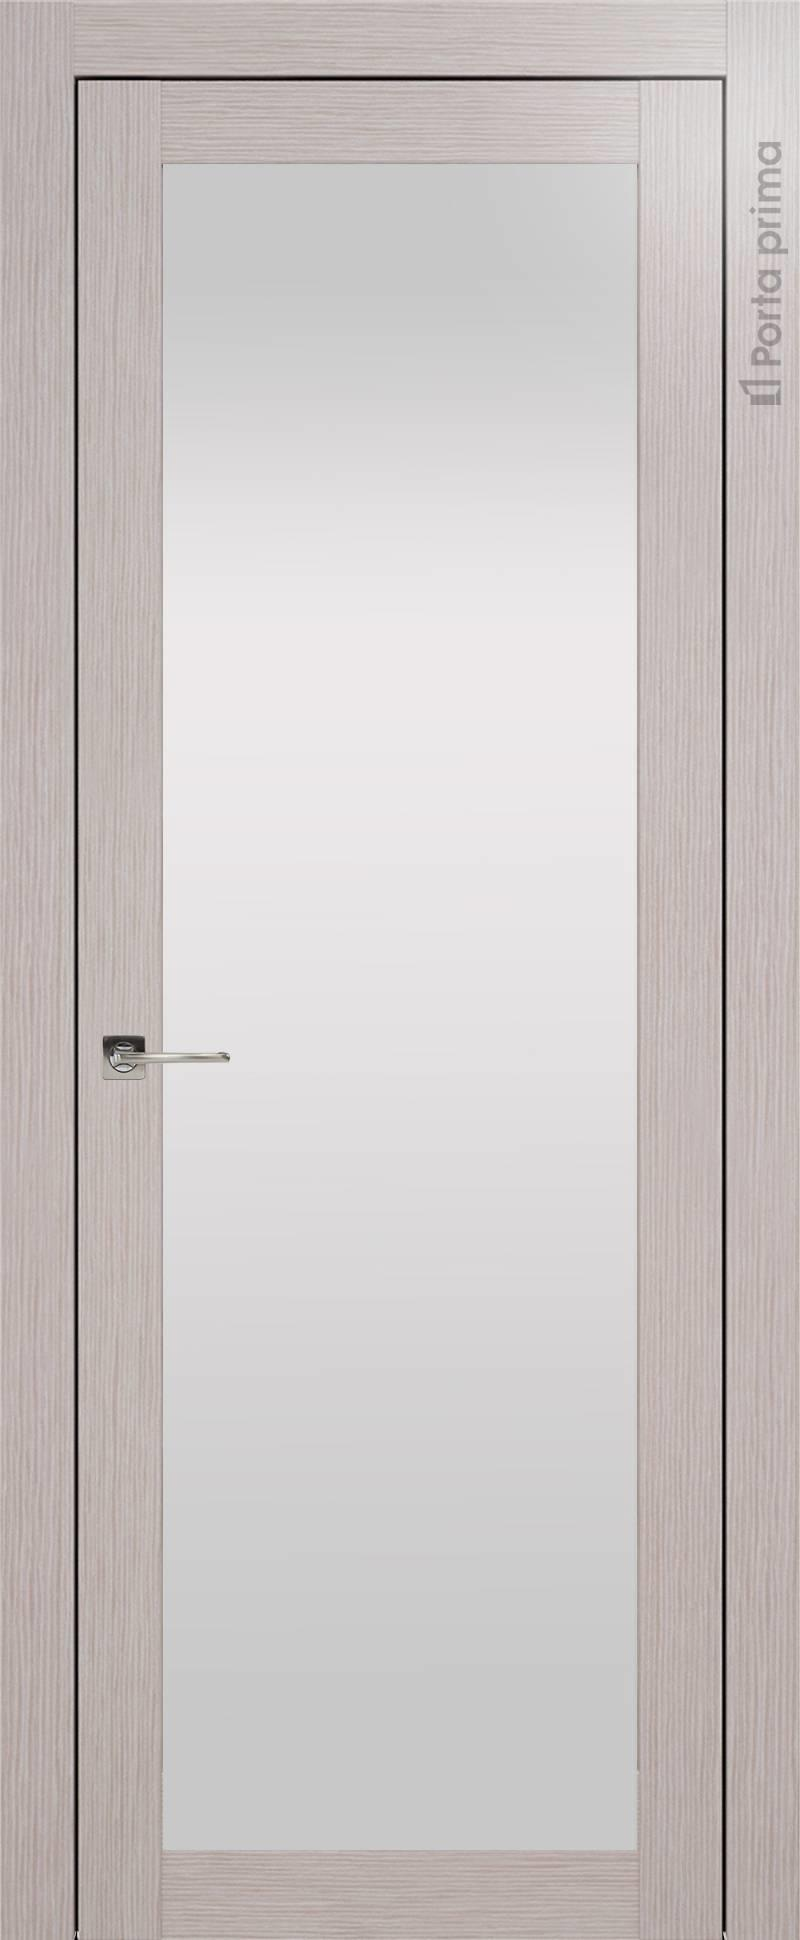 Tivoli З-1 цвет - Дымчатый дуб Со стеклом (ДО)